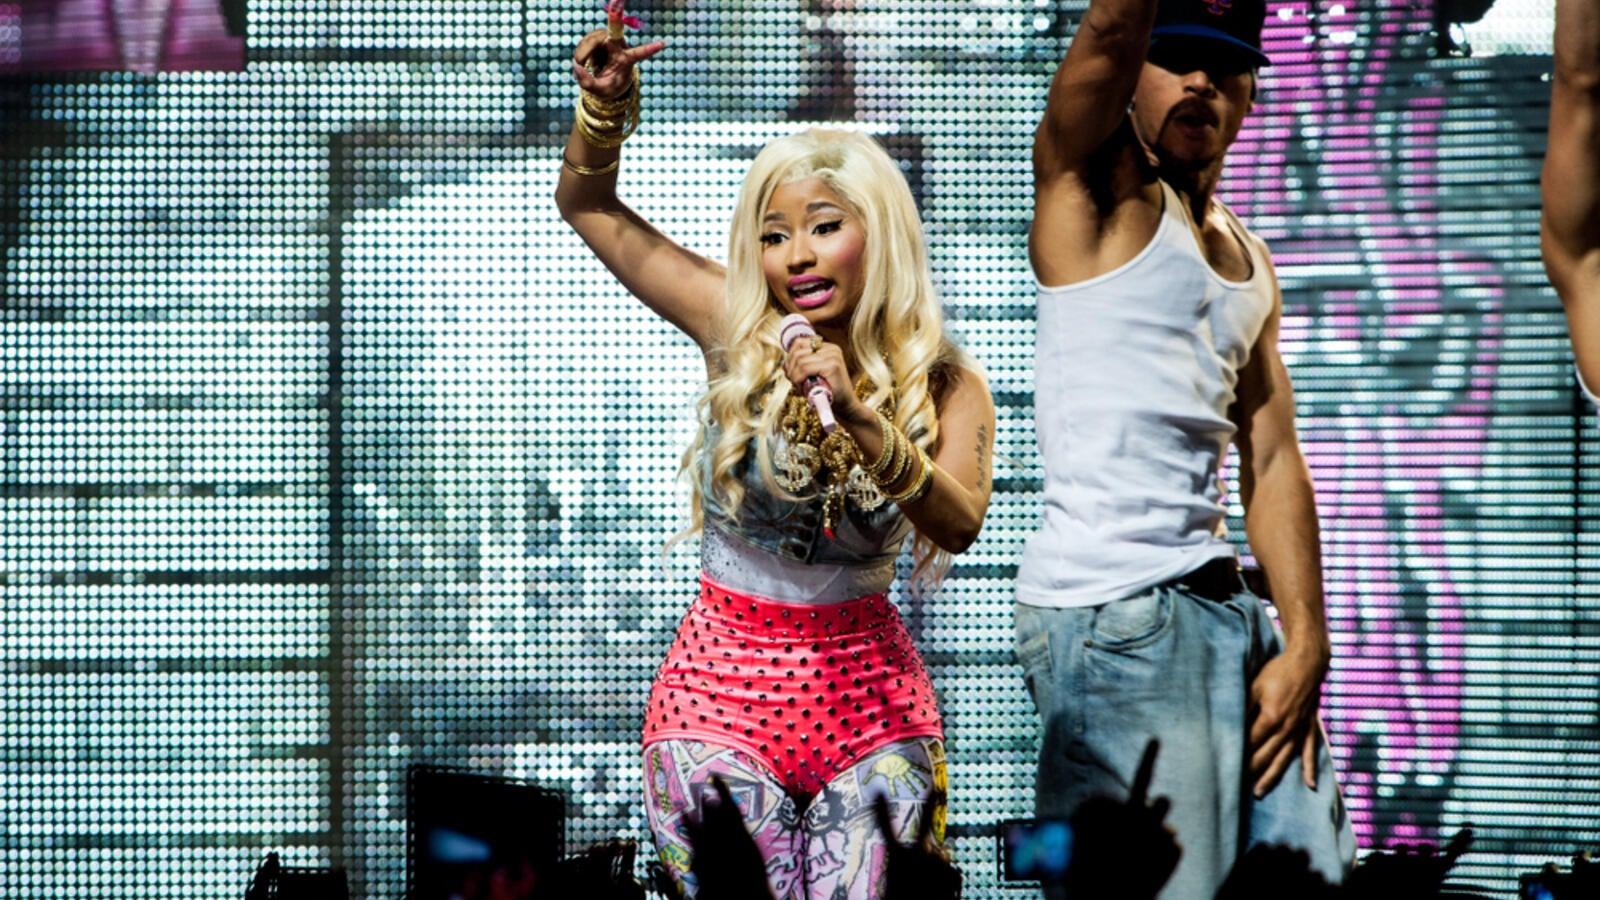 Nicki Minaj cancels her concert at Saudi Arabia